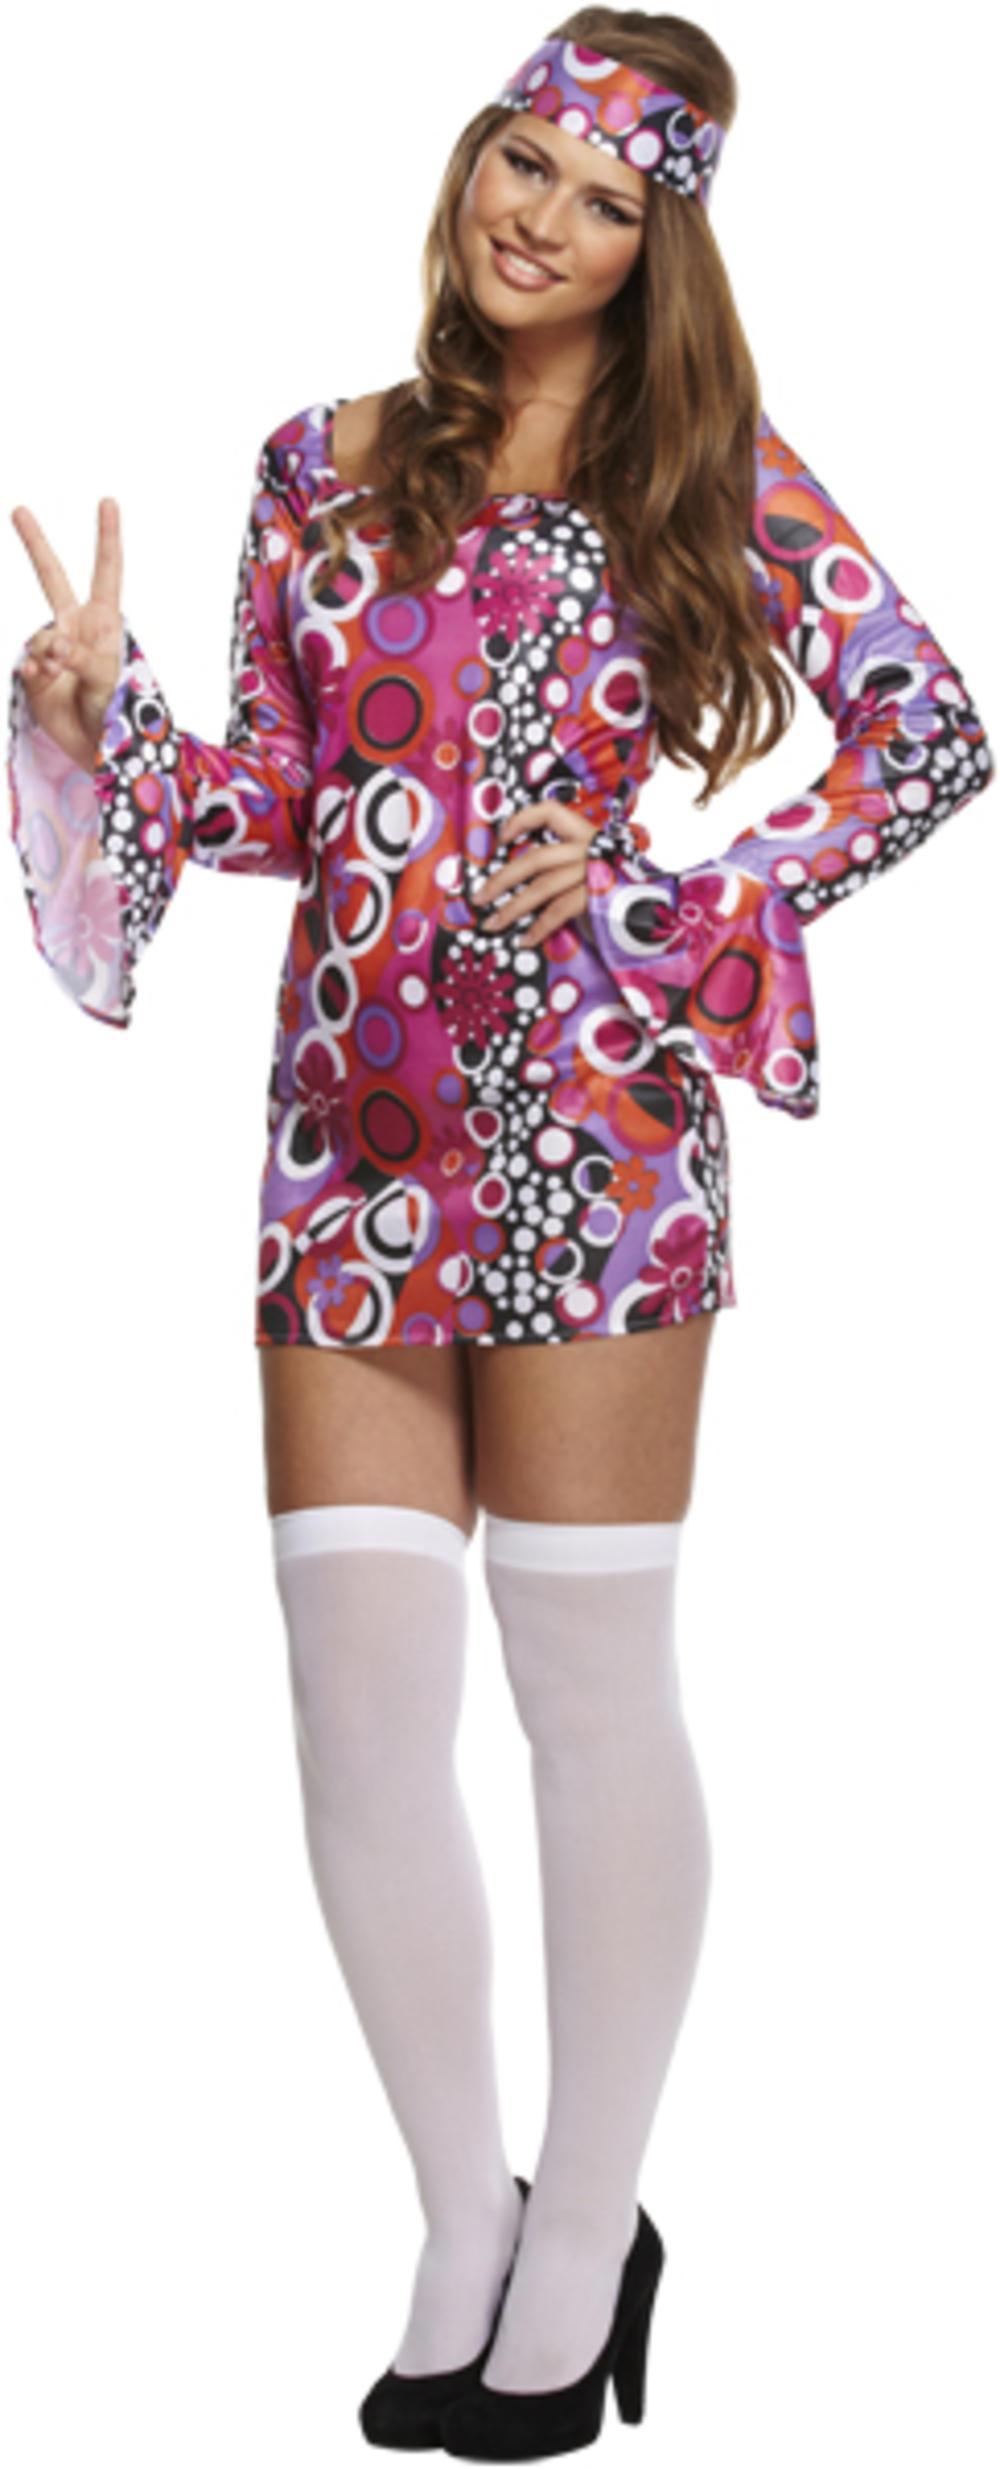 Hippie Girl Costume